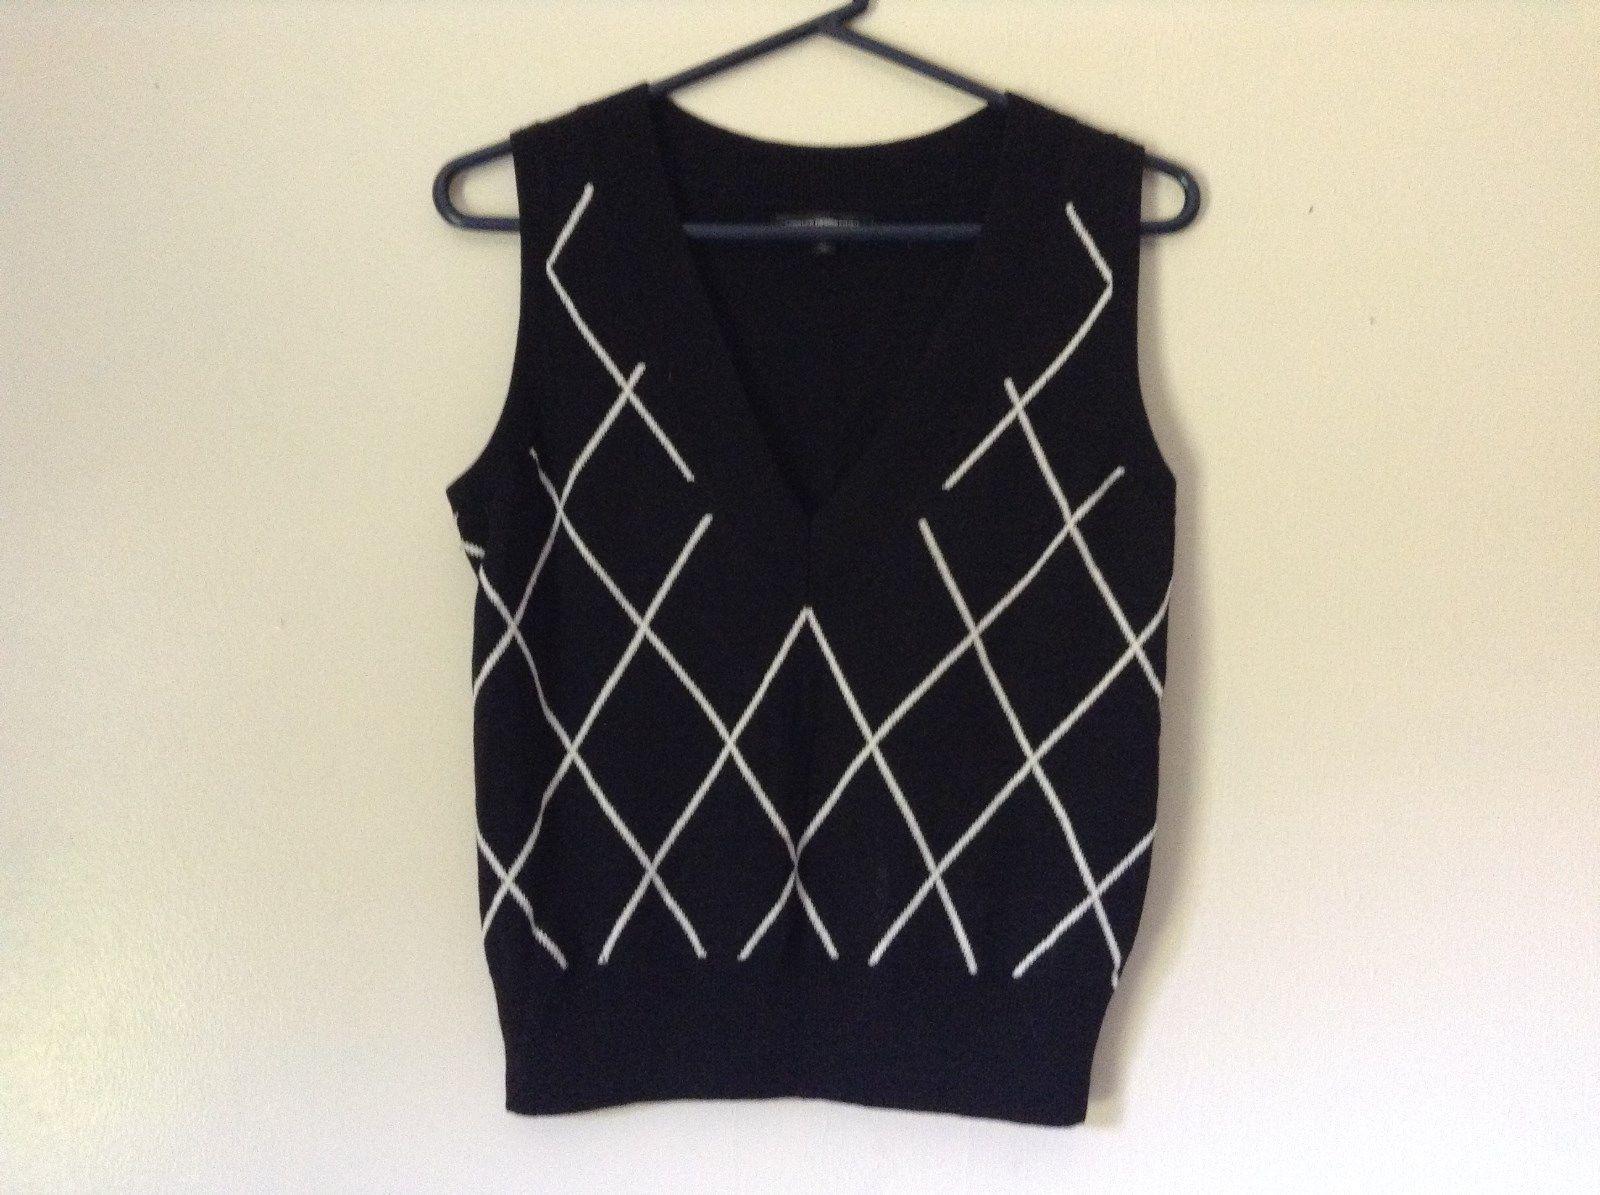 Express Design Studio Black Vest V Neck Sleeveless White Design Size Medium